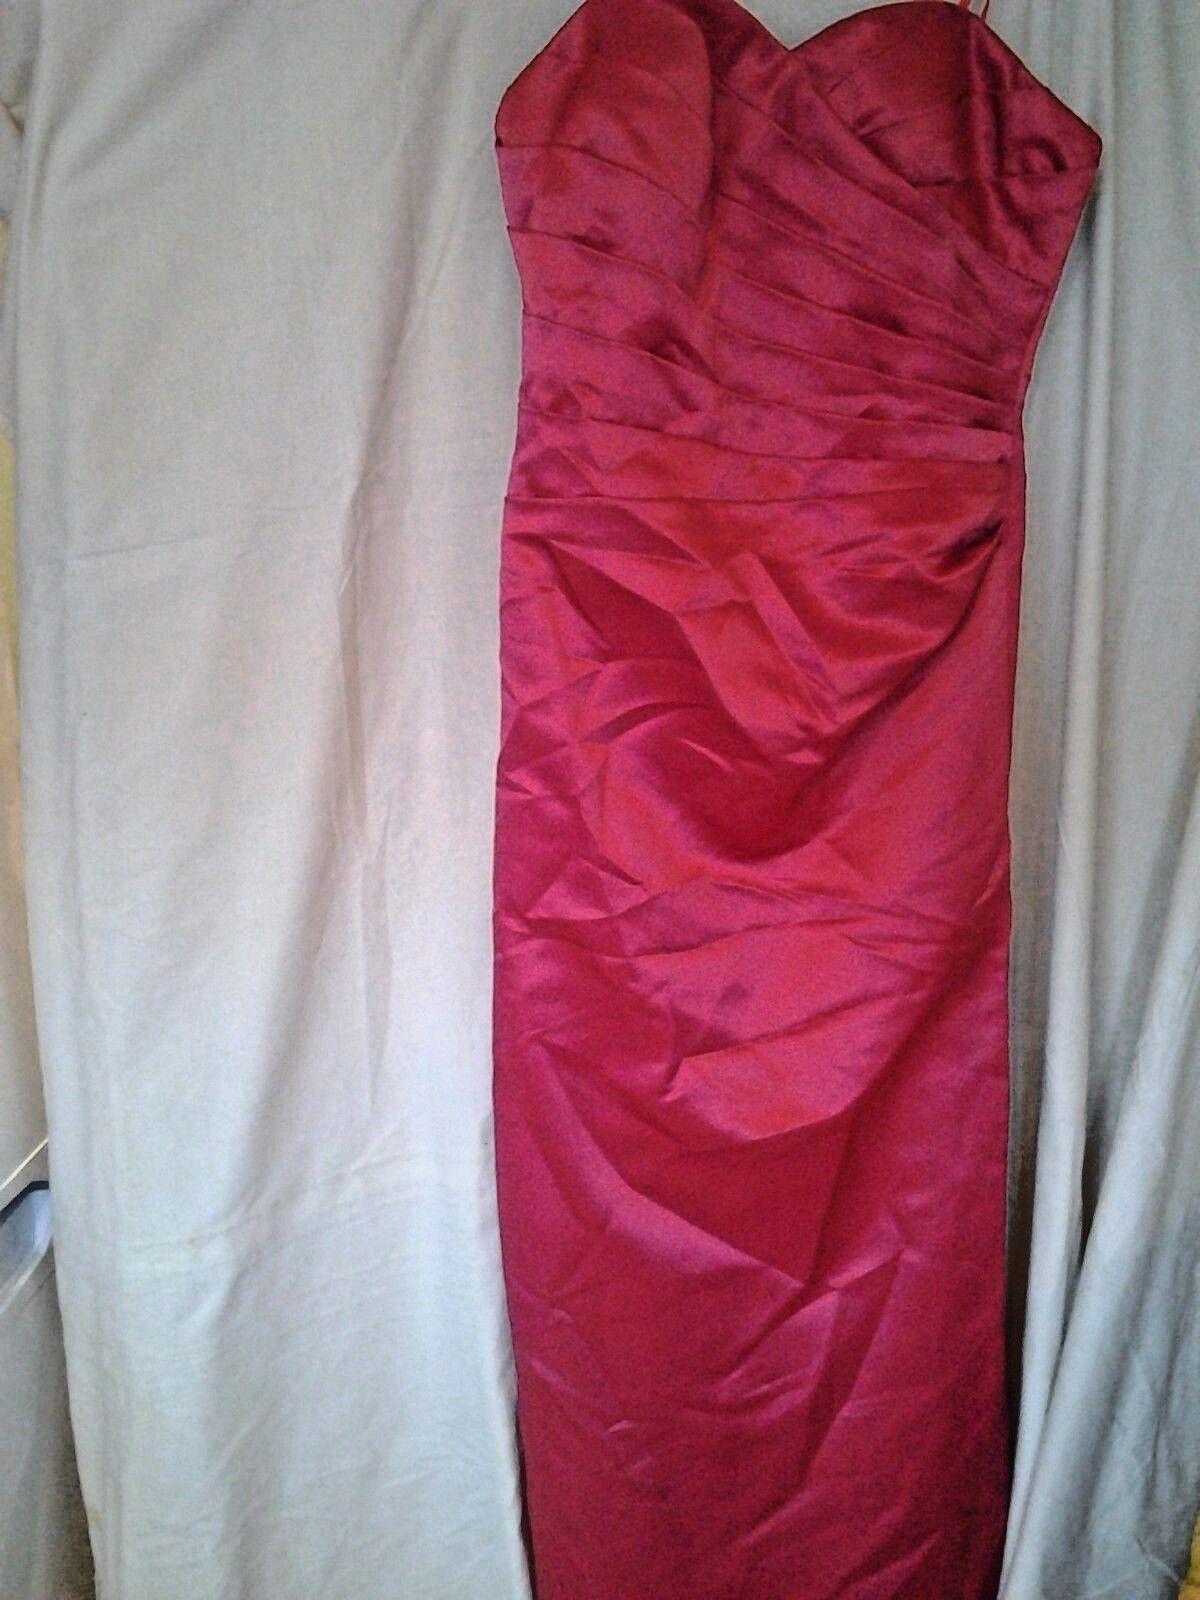 2 Bridesmaids dresses 14 and 16 full length strapless false crossover polysatin